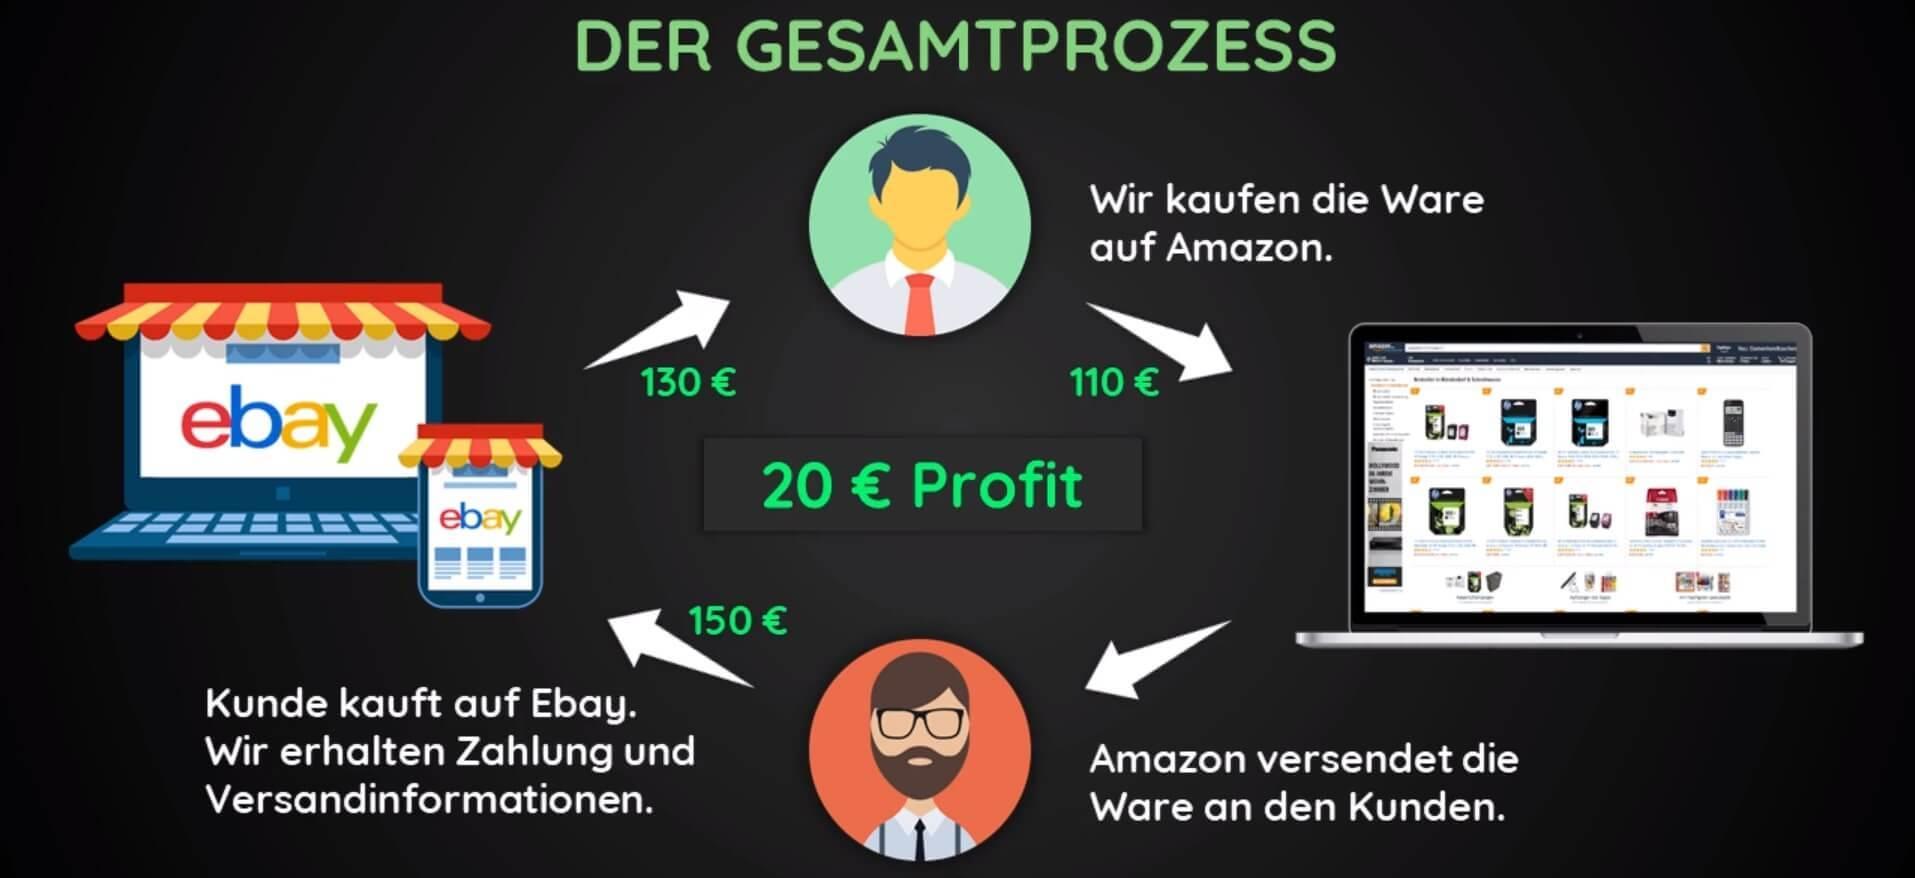 Ebay Dropshipping MasterClass von Yigit Sert.